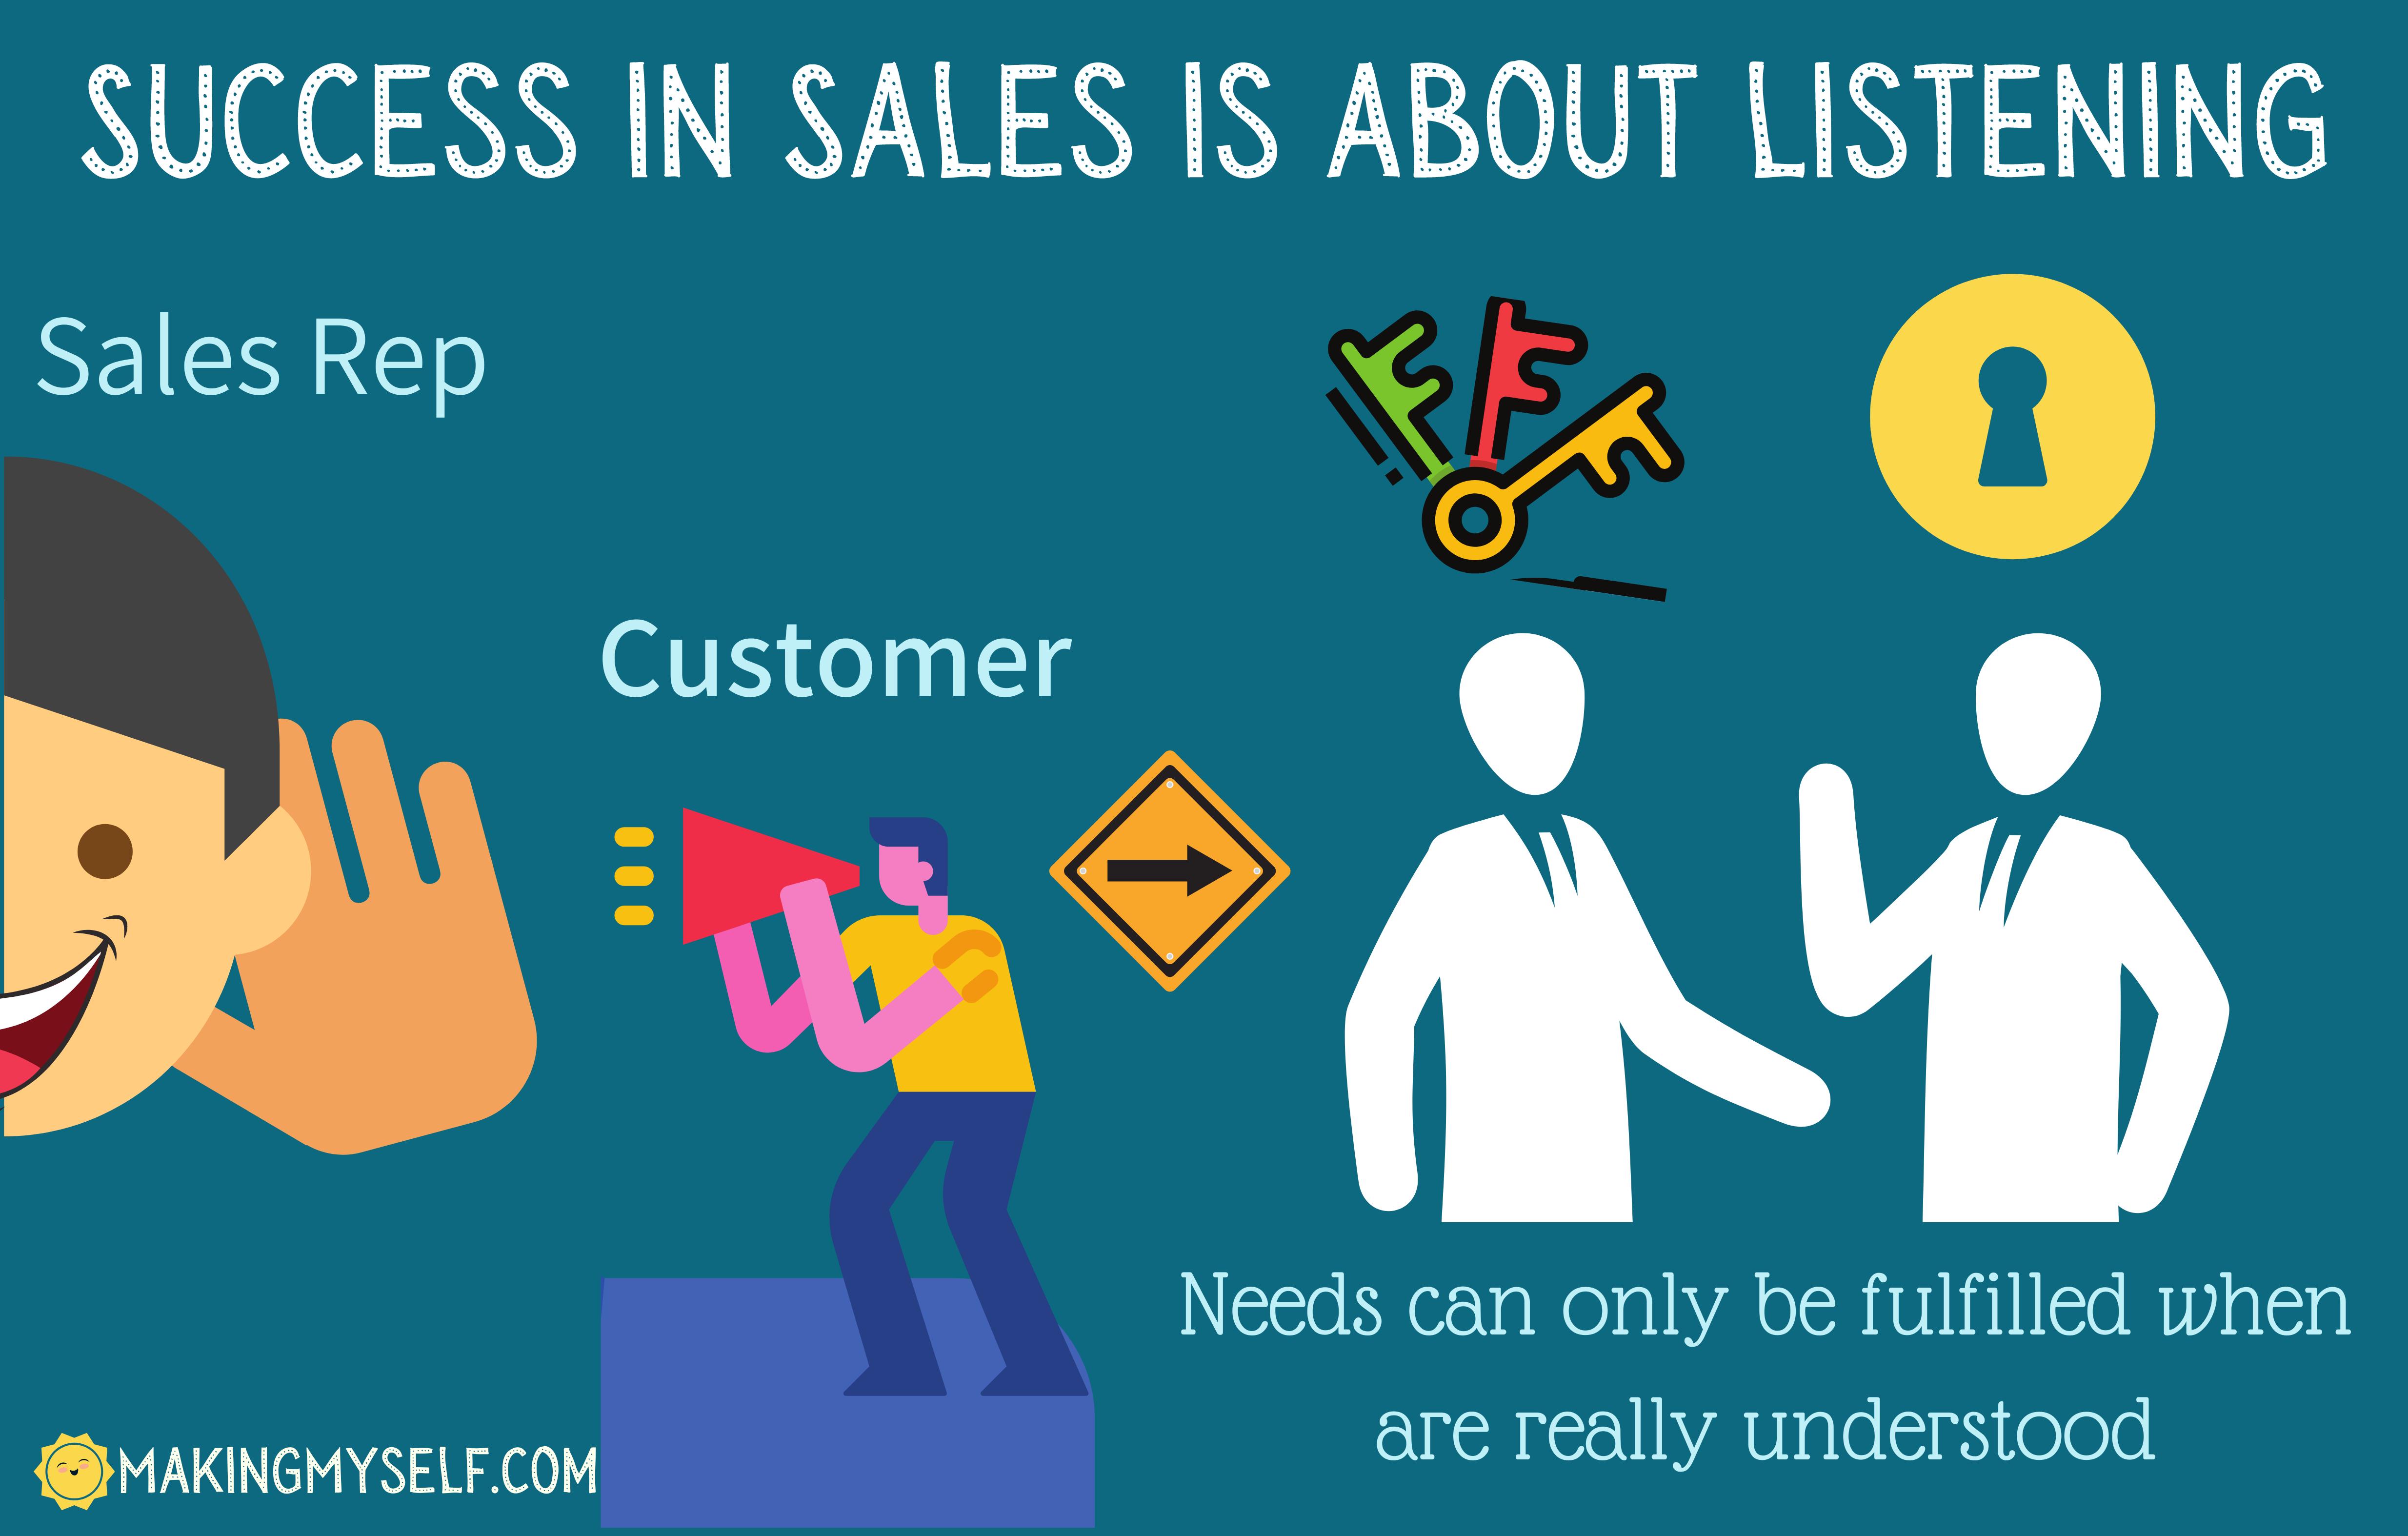 Success in sales